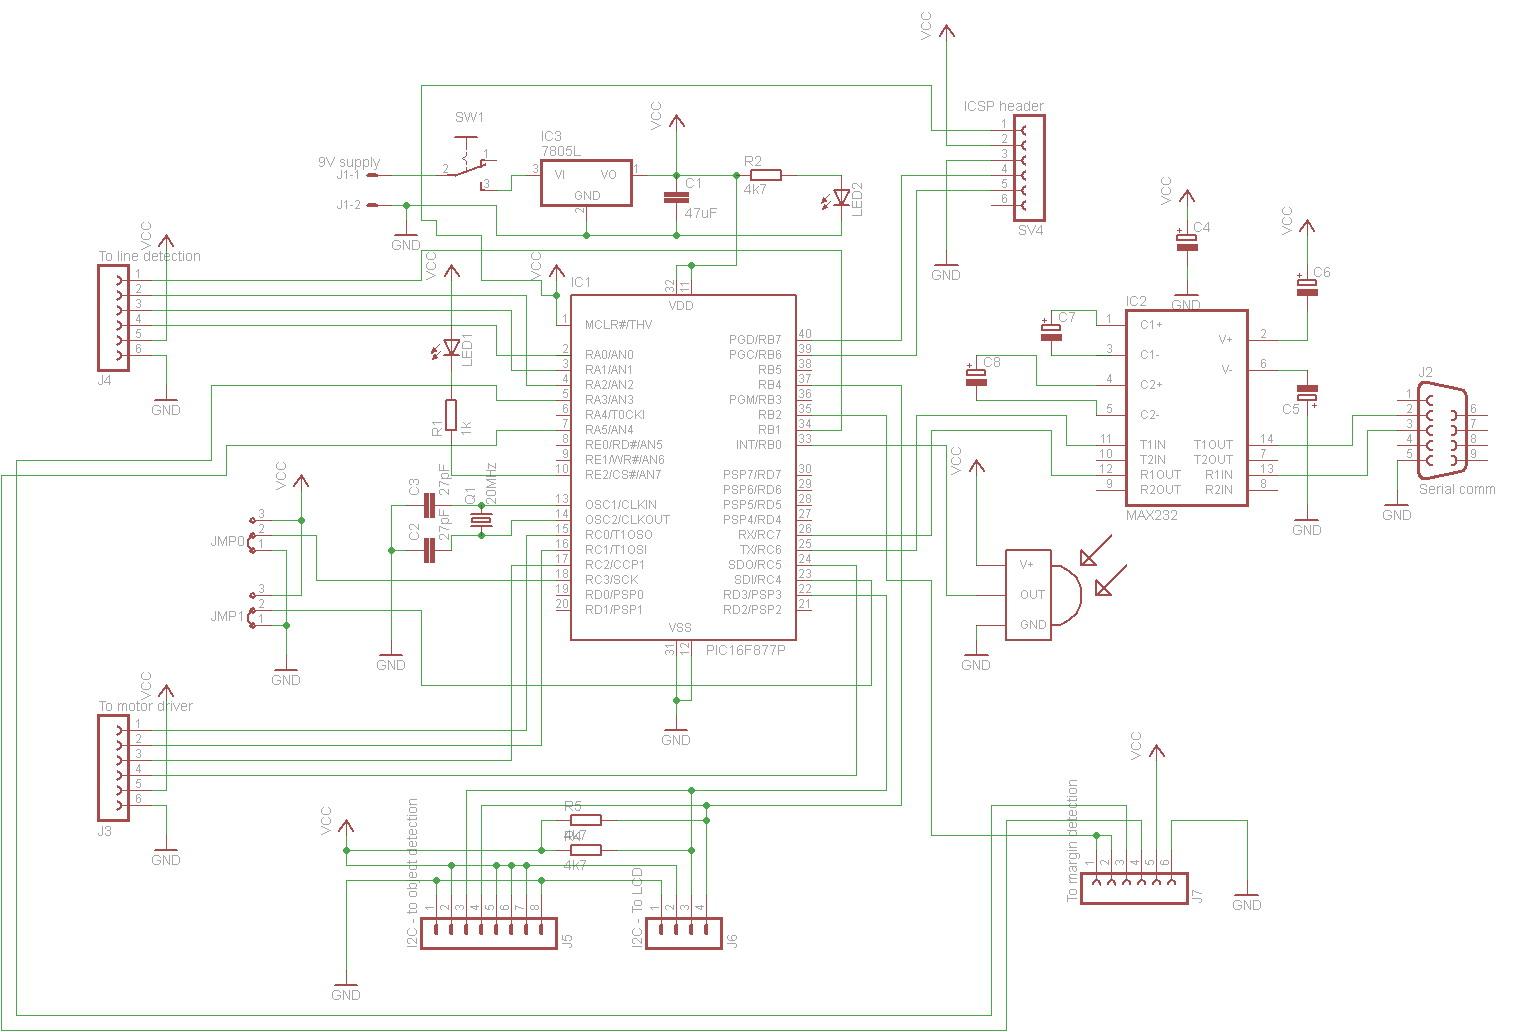 infoelectronica ro - revista - robotul minisumo mr1